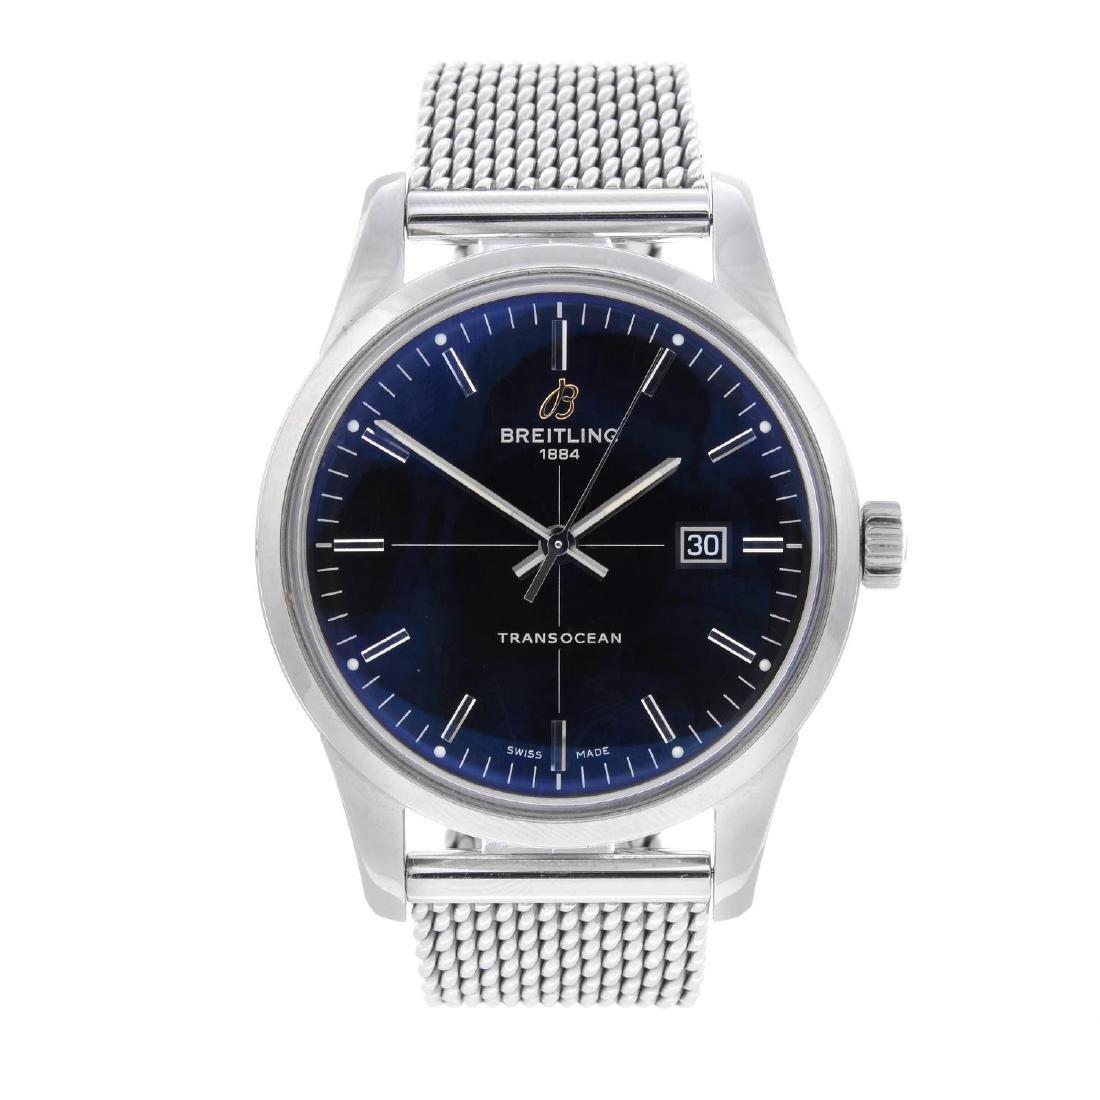 BREITLING - a gentleman's Transocean bracelet watch.